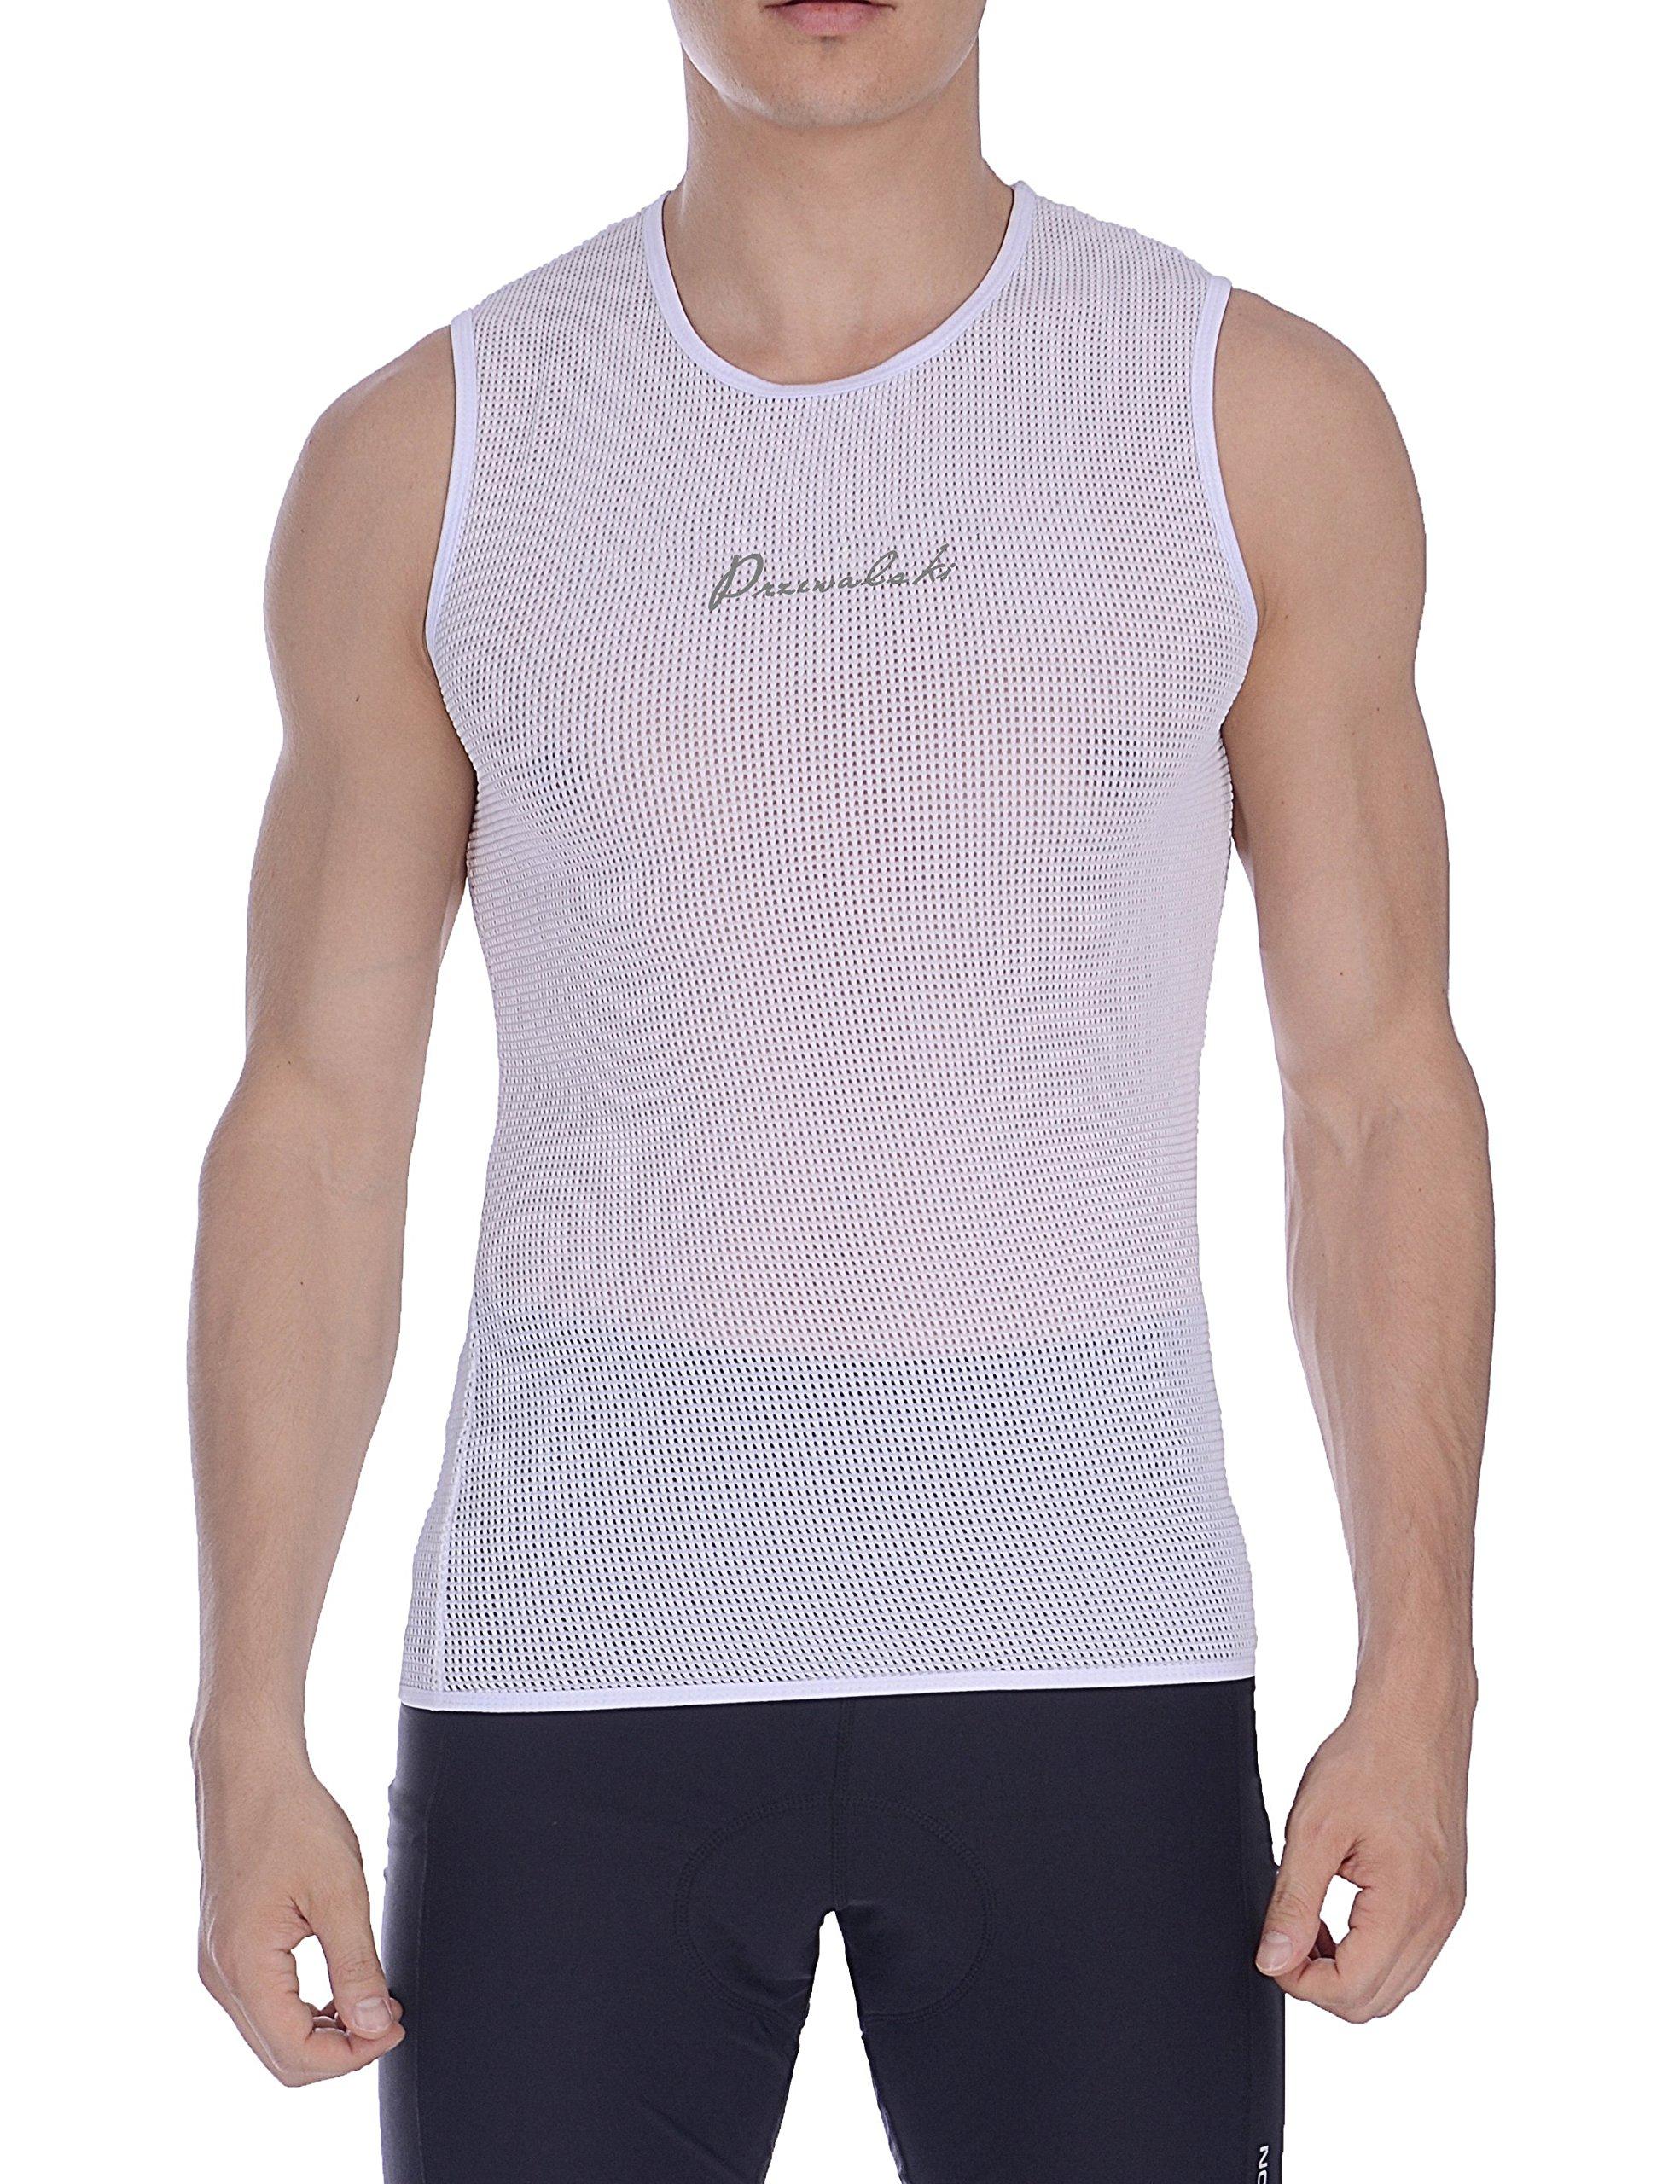 Przewalski Men's Sleeveless Cycling Bike Base Layer Undershirt, Breathable, Superlight and Moisture Wicking Vests